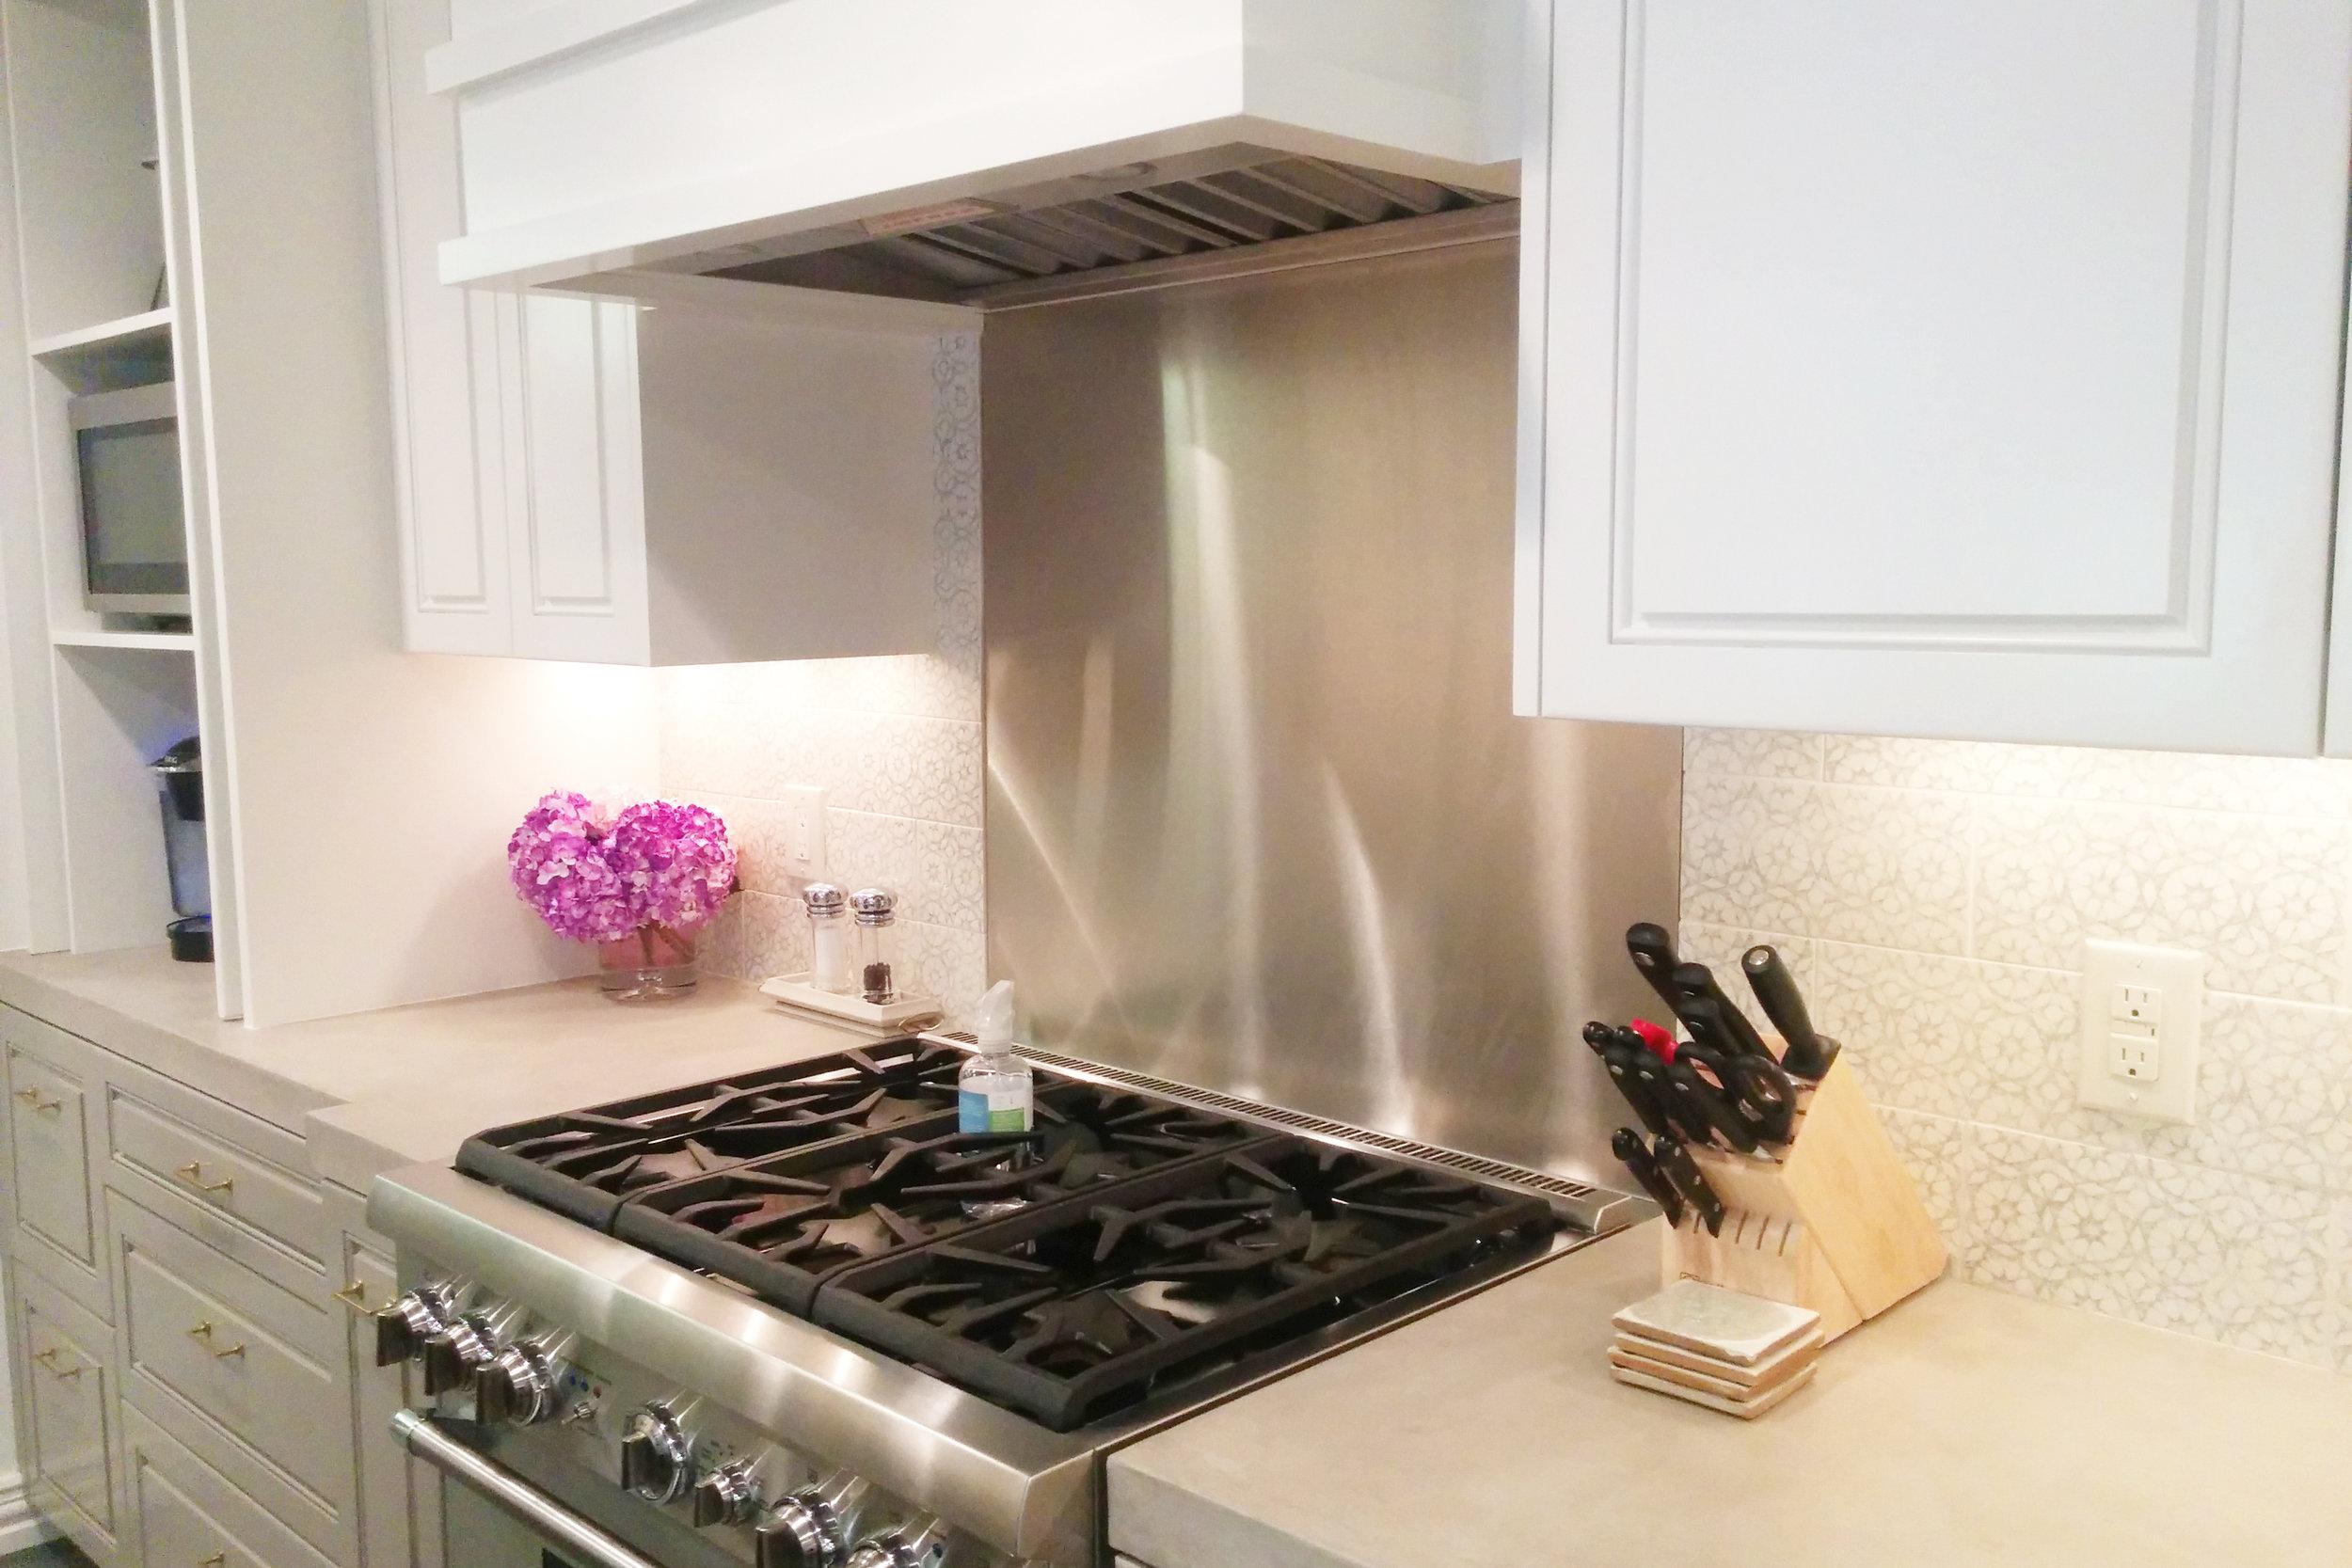 Pratt and Larson tile backsplash with stainless steel panel behind range in Houston kitchen remodel by Jamie House Design.